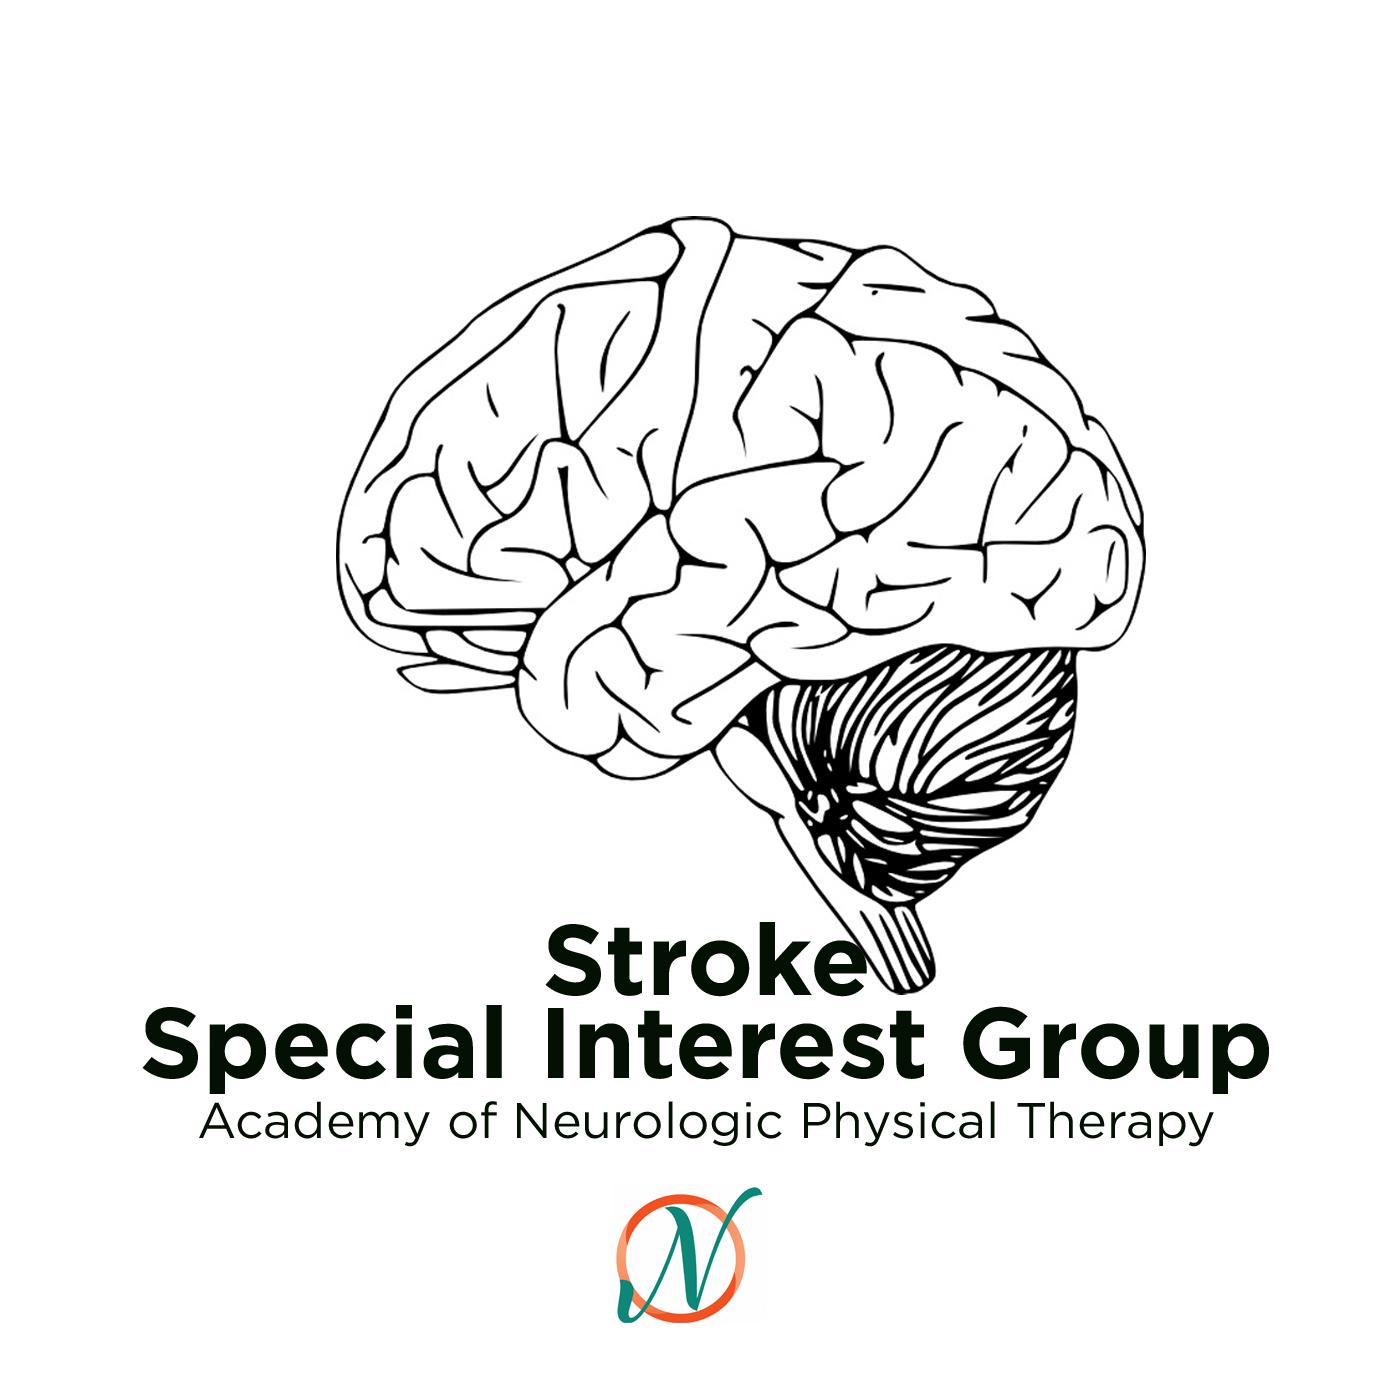 ANPT Stroke Special Interest Group